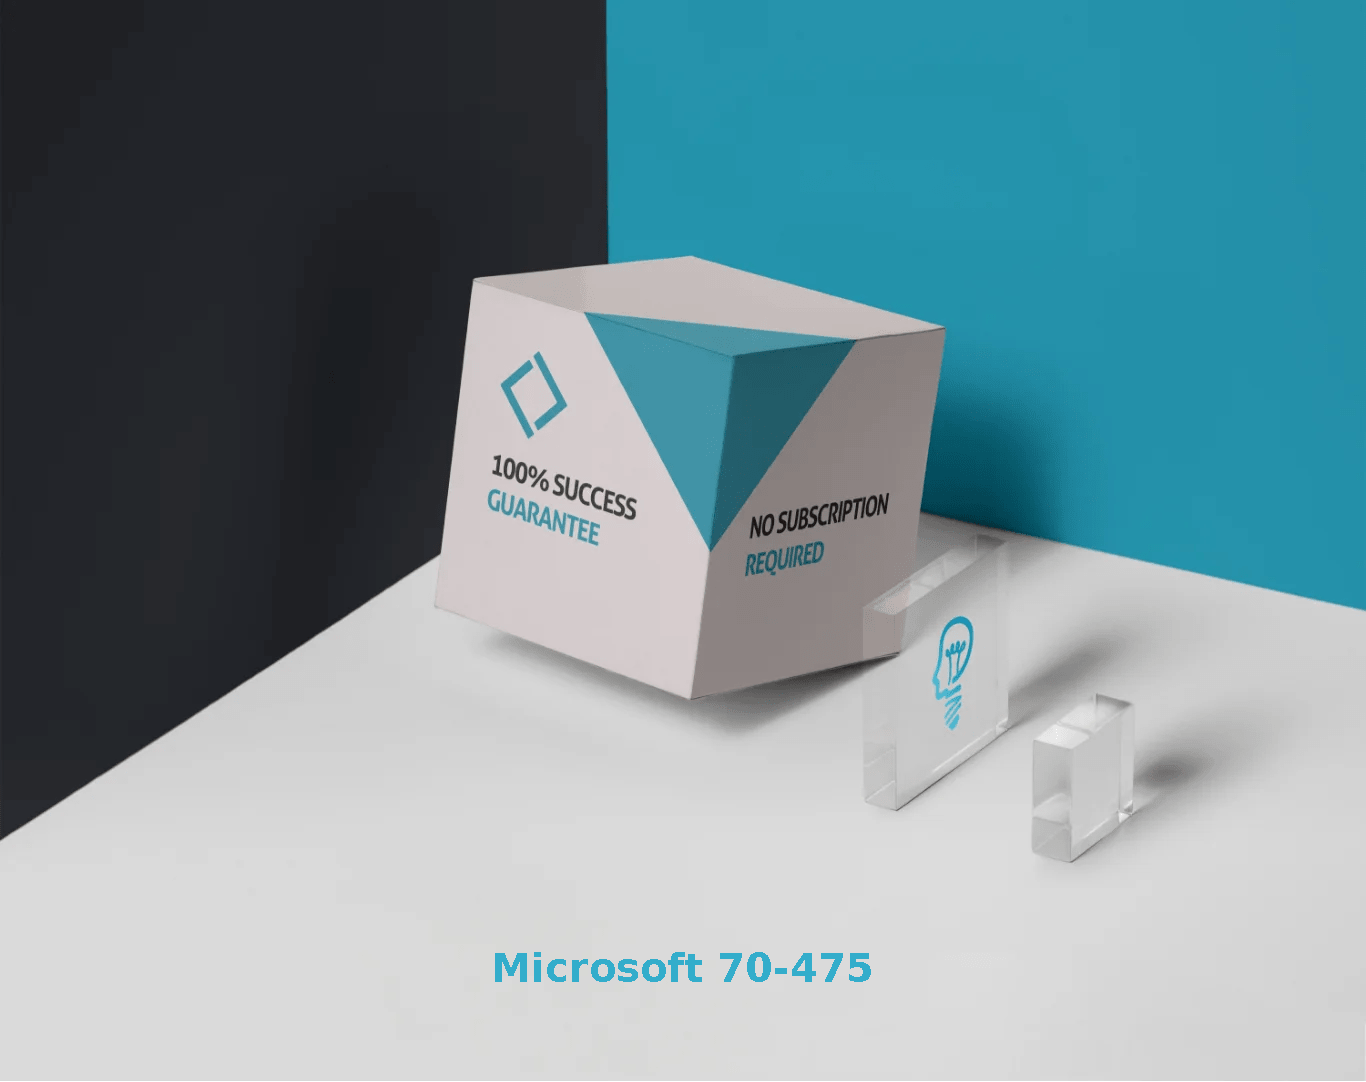 Microsoft 70-475 Exams